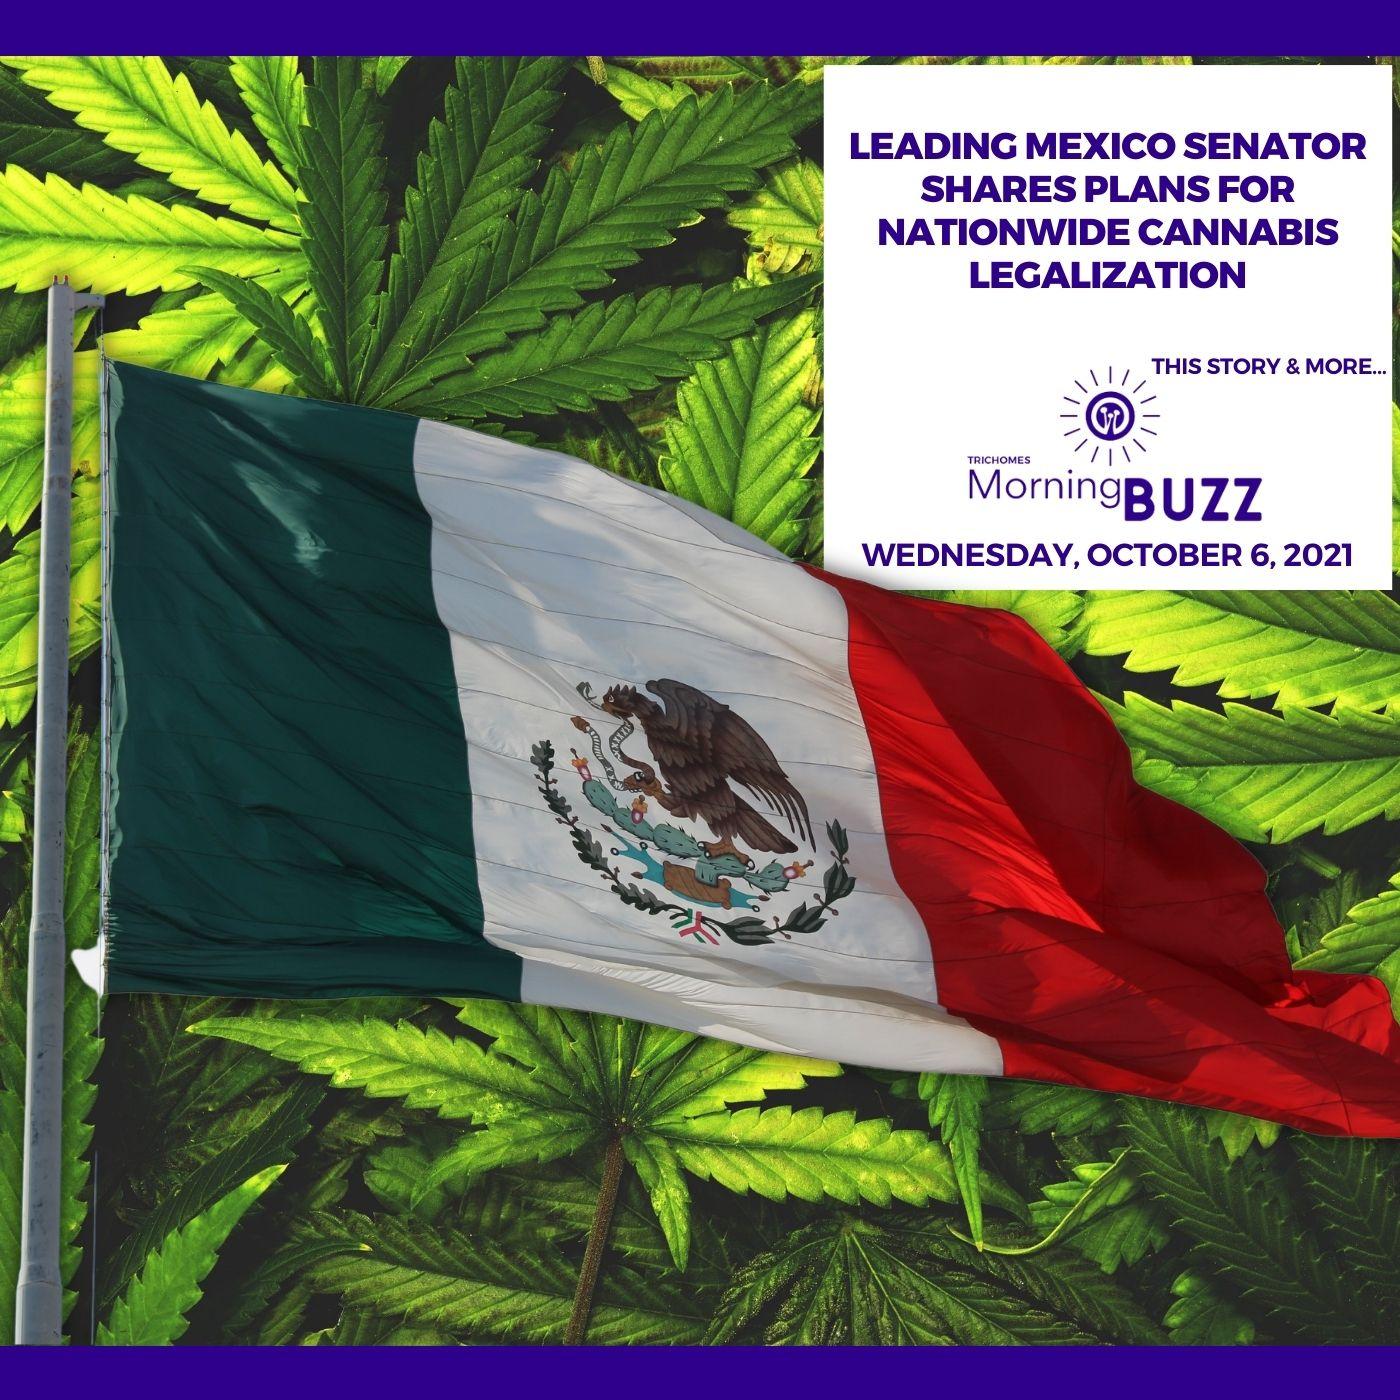 Leading Mexico Senator Shares Plans For Nationwide Cannabis Legalization show art